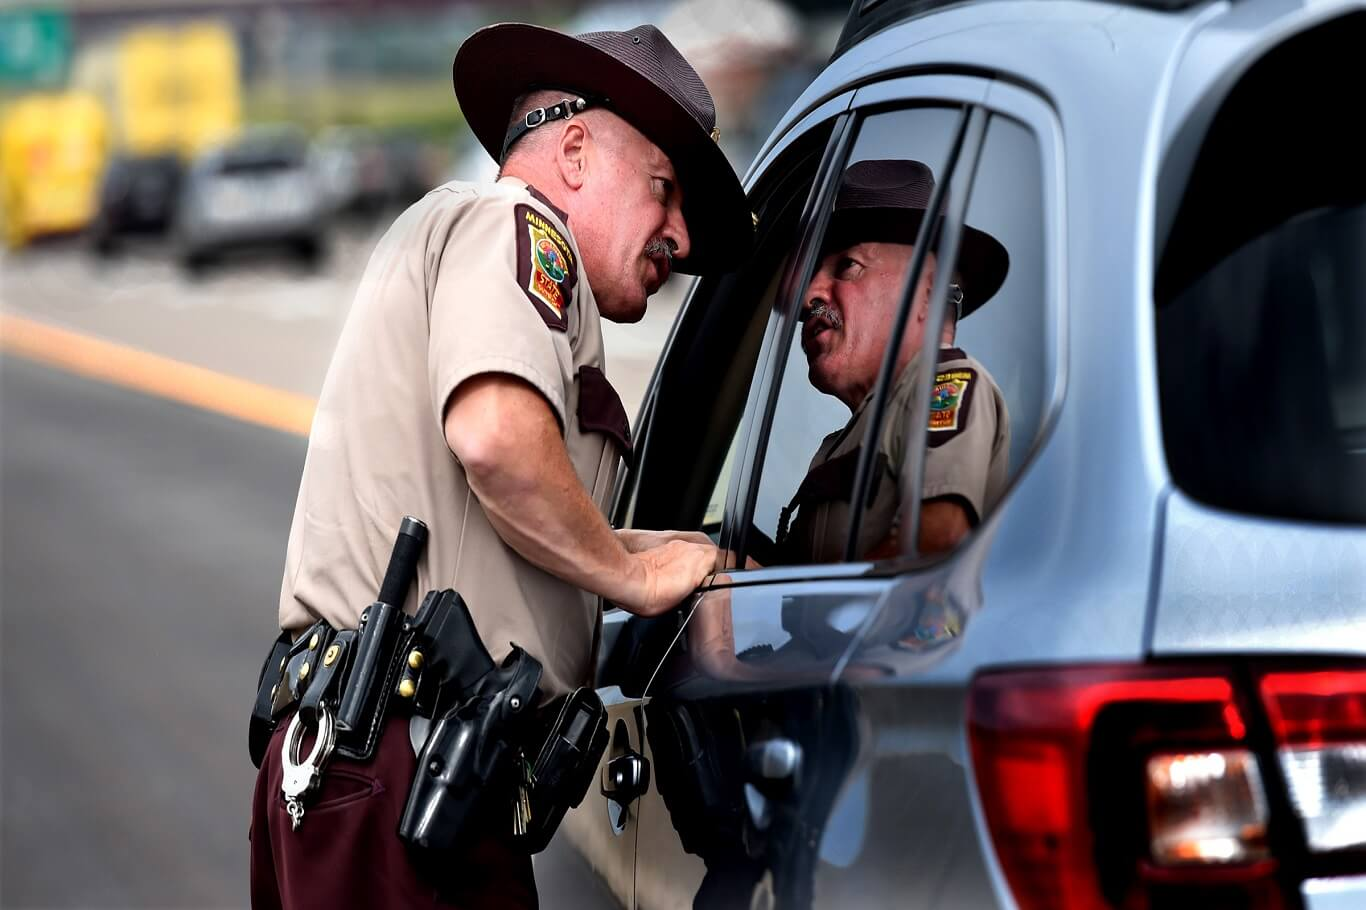 car that gets traffic ticket